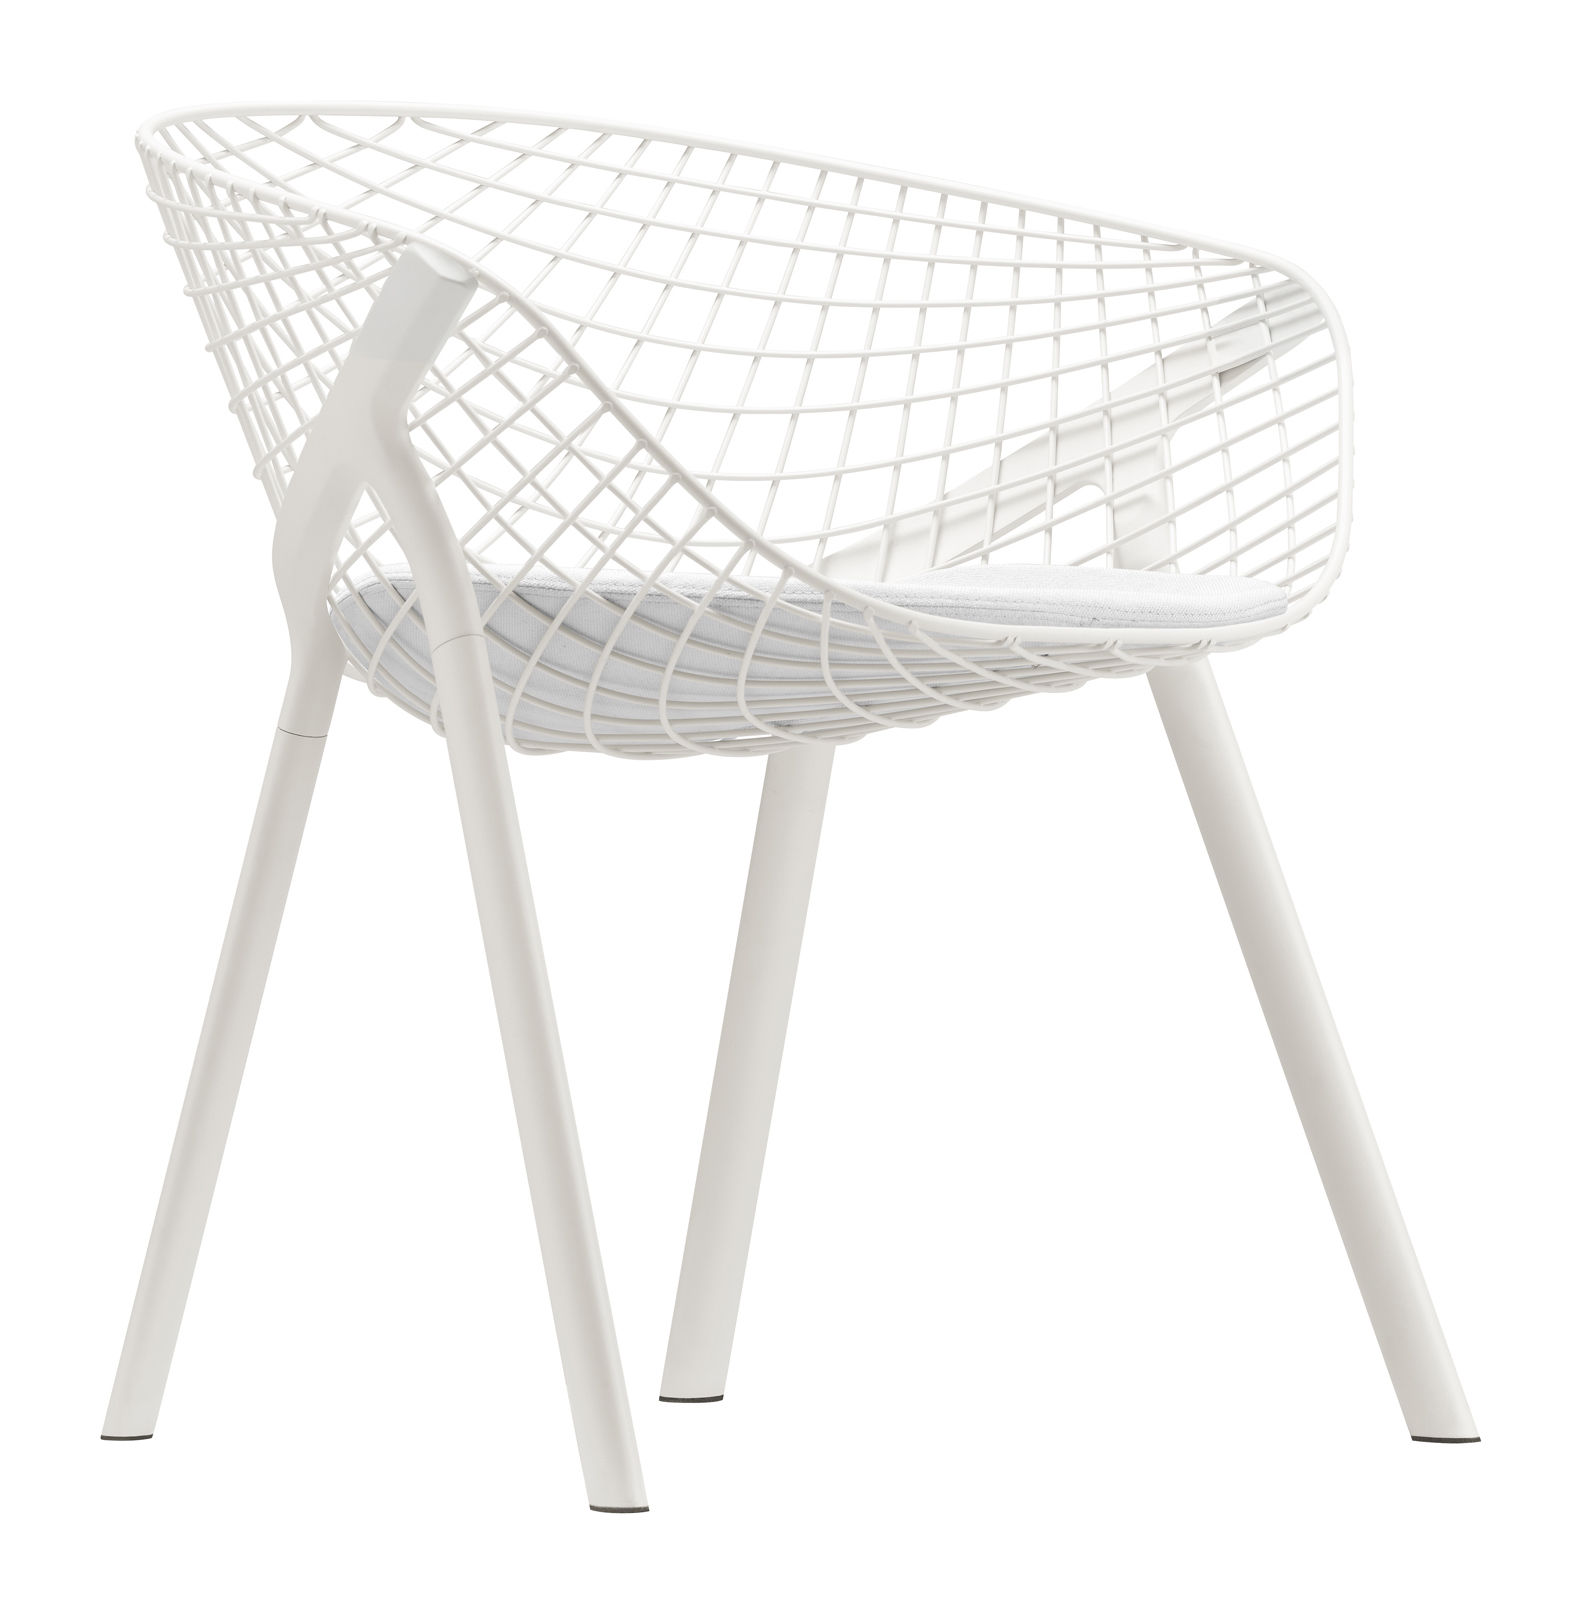 Furniture - Chairs - Kobi Armchair - Metal / Small cushion by Alias - White frame - White cushion - Fabric, Lacquered aluminium, Lacquered steel